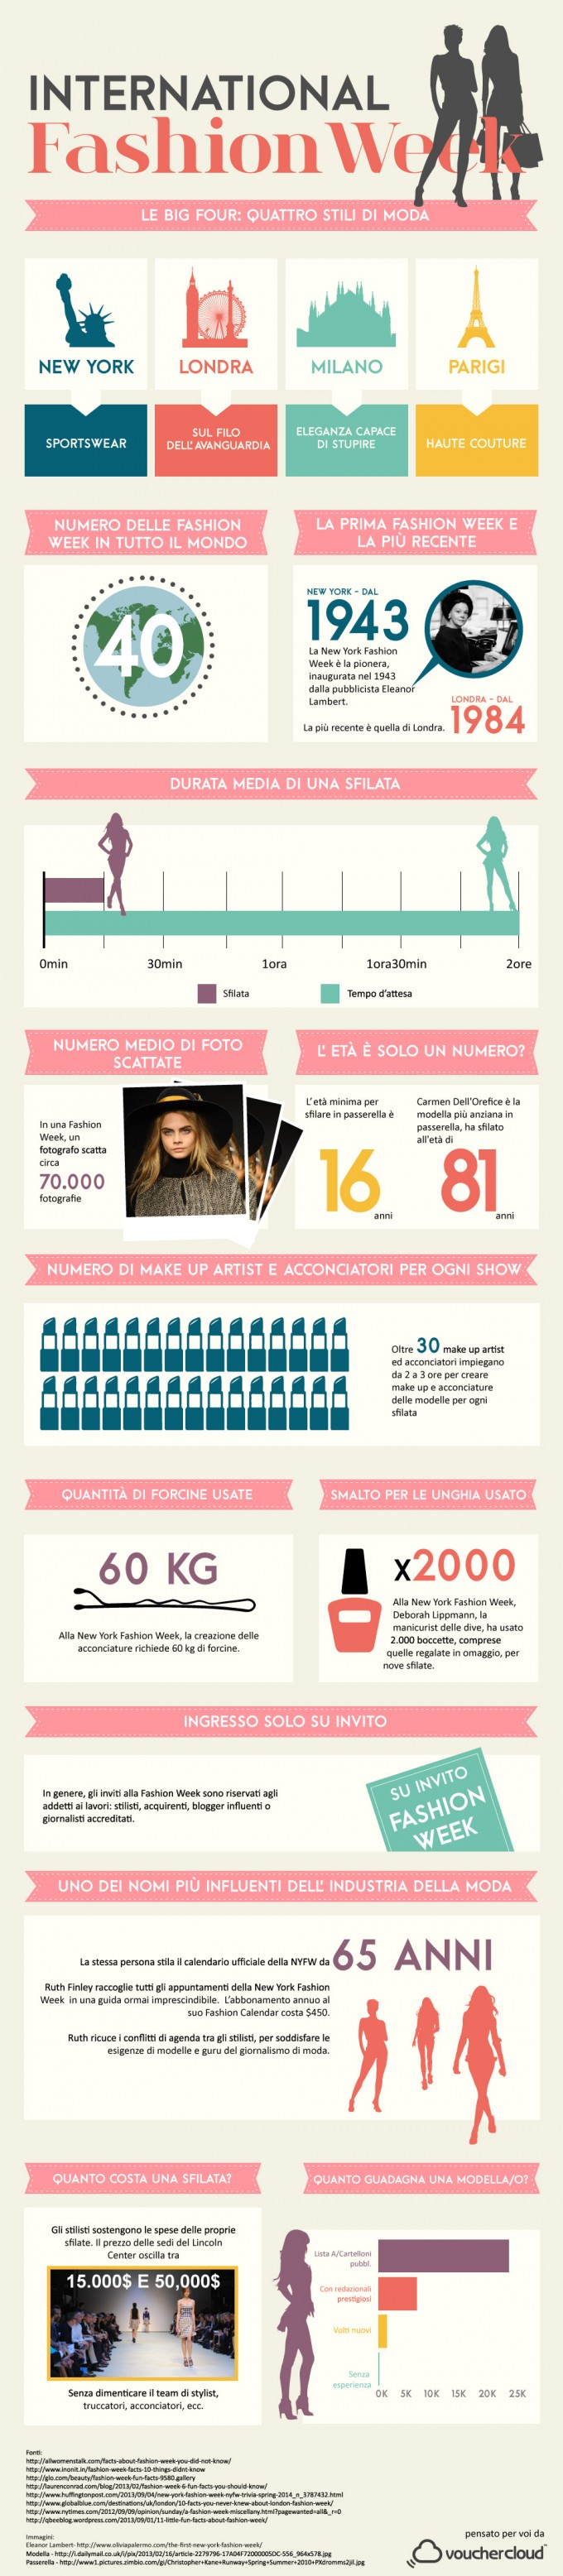 Fashion-week-infographic-IT